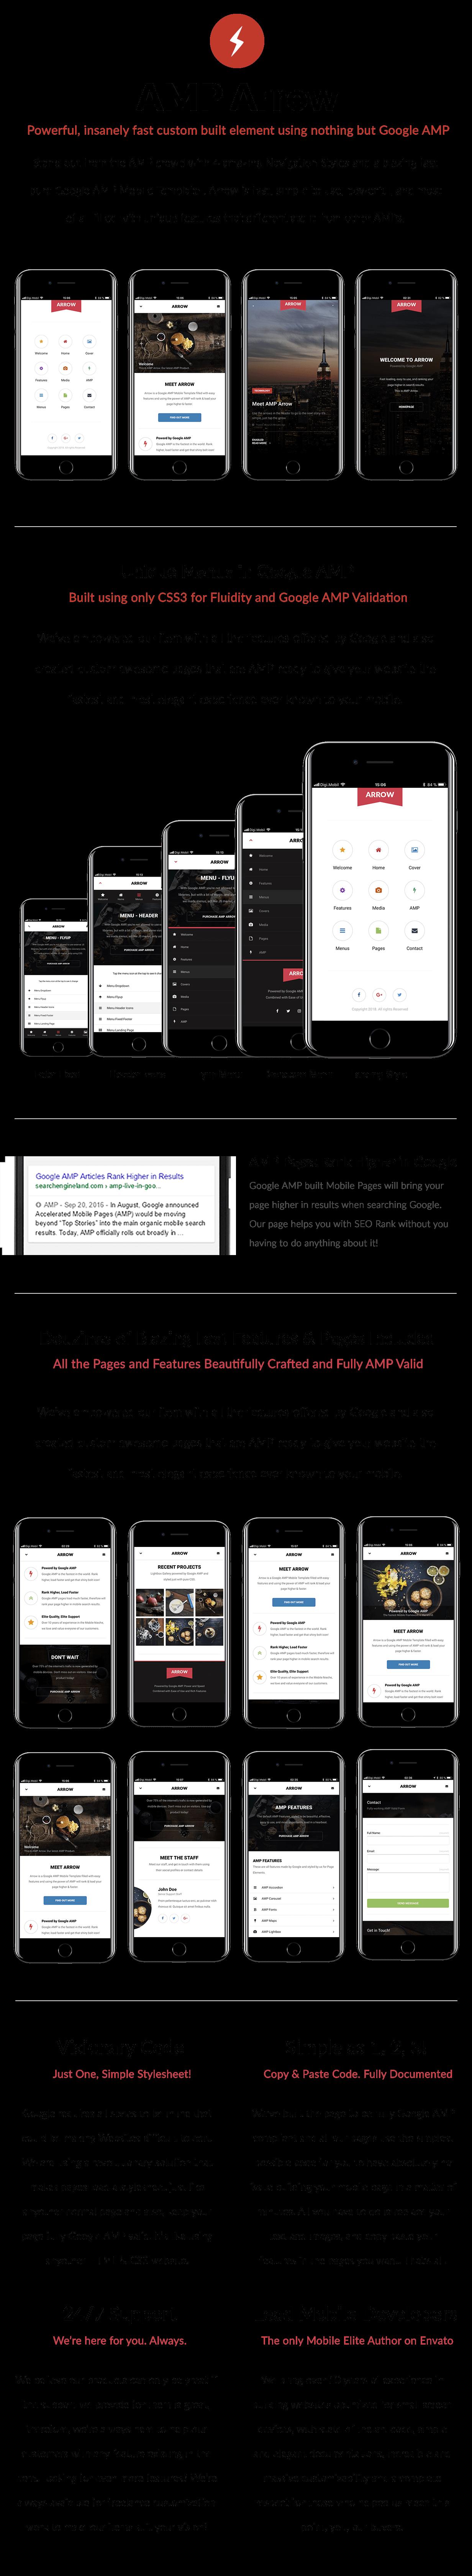 AMP Arrow | Mobile Google AMP Template - 8